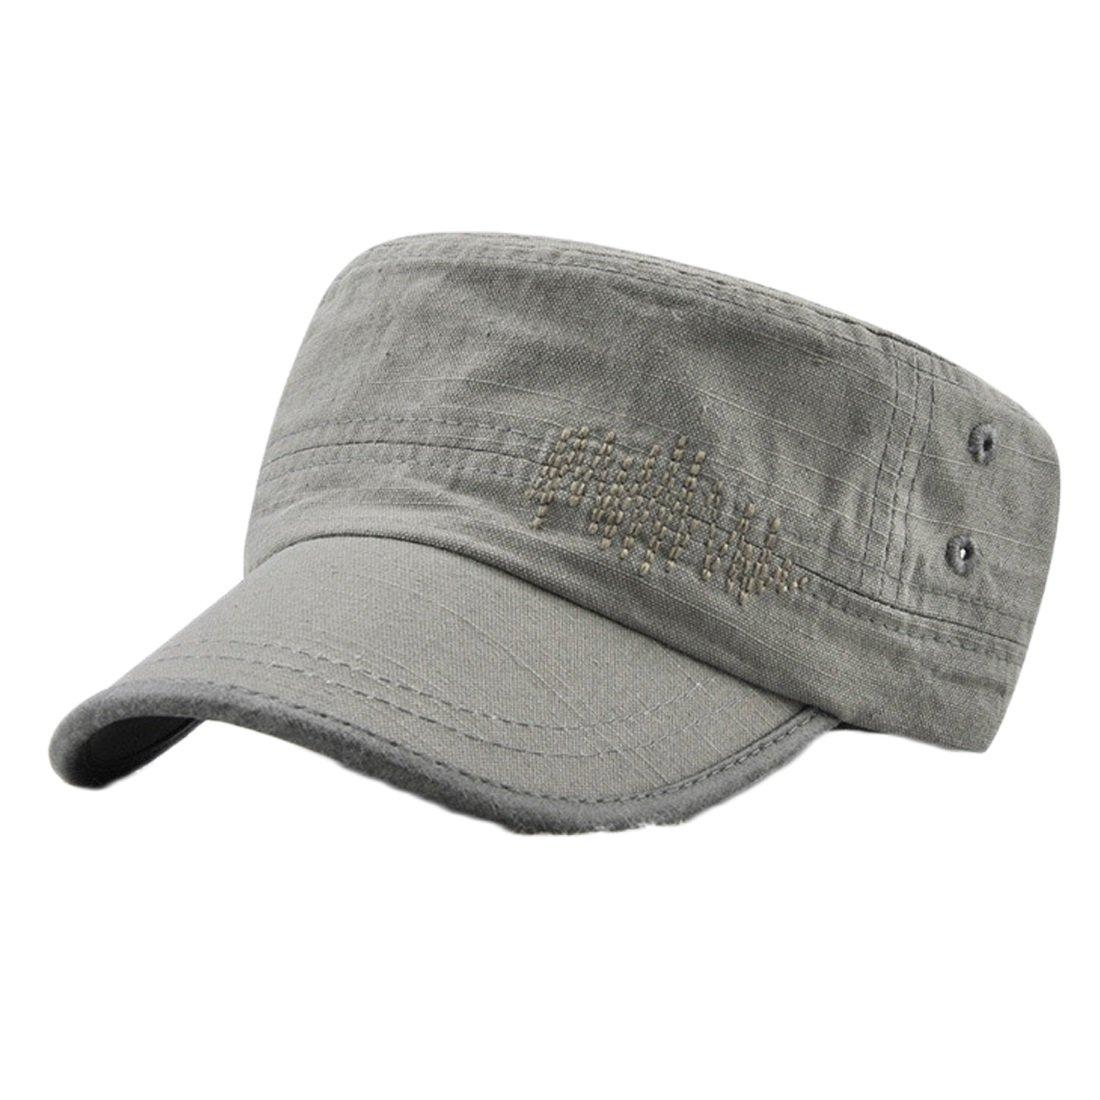 Gorras de Exterior clásicas Cubiertas de algodón, Gorras Planas ...